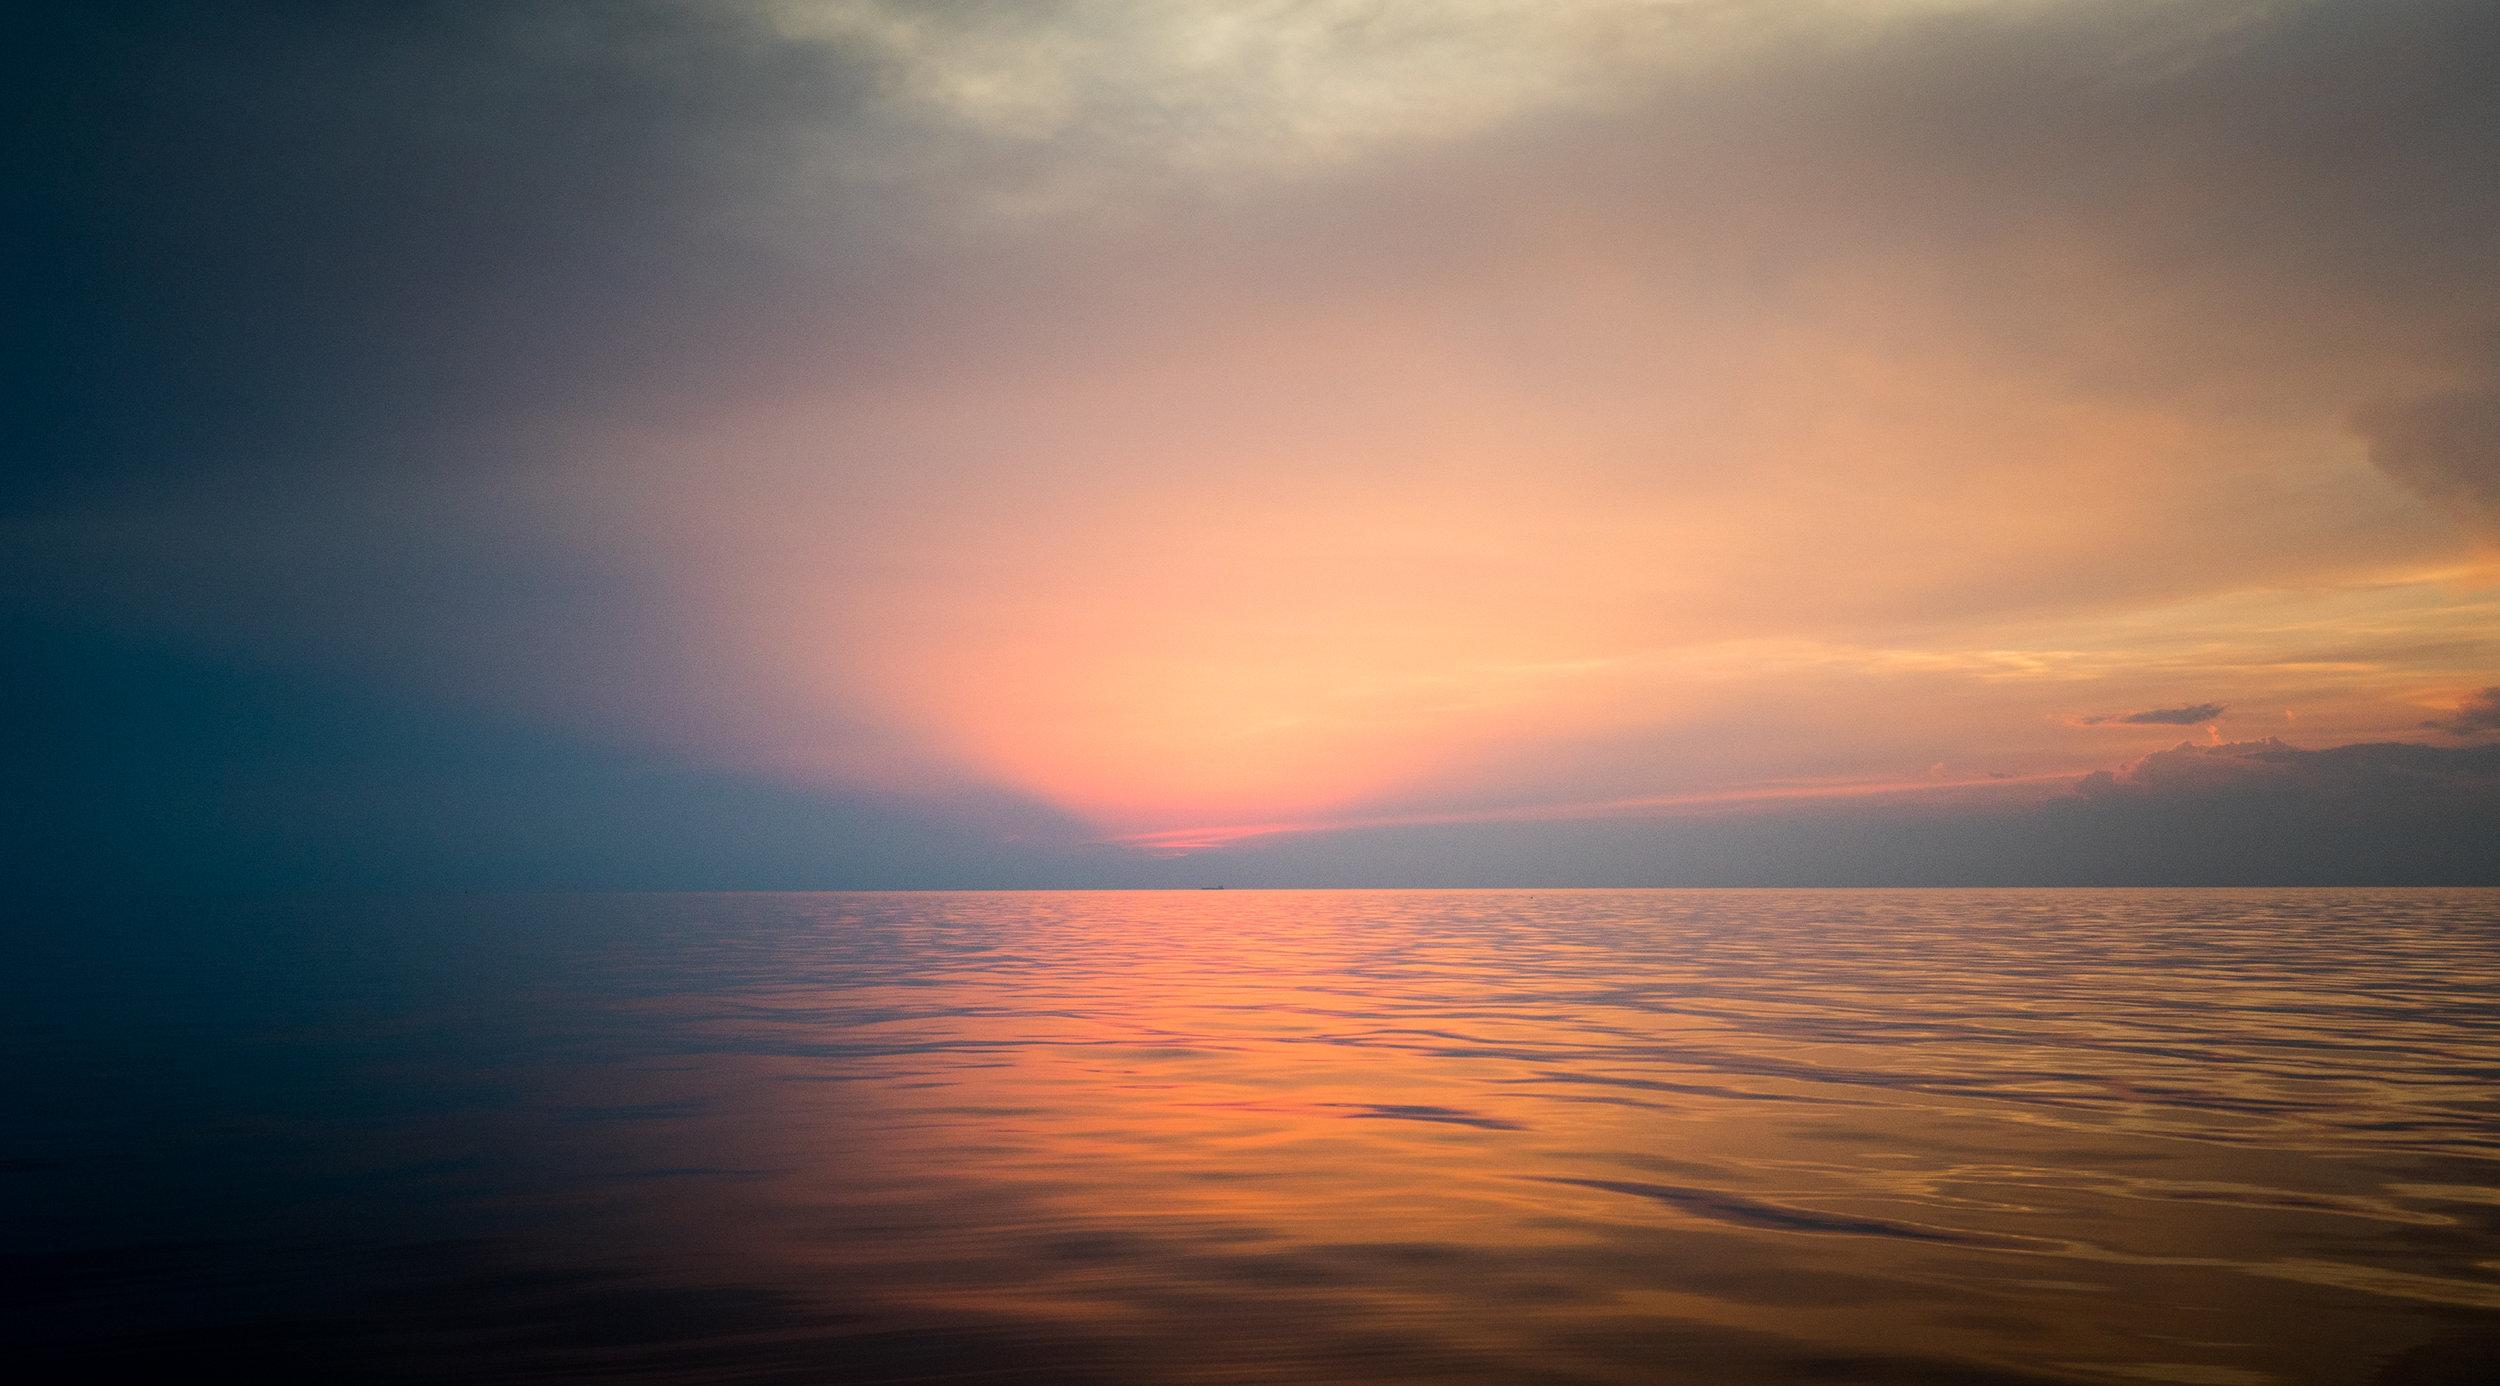 Sunset out in the Pelagos Sanctuary, Mediterranean Sea.